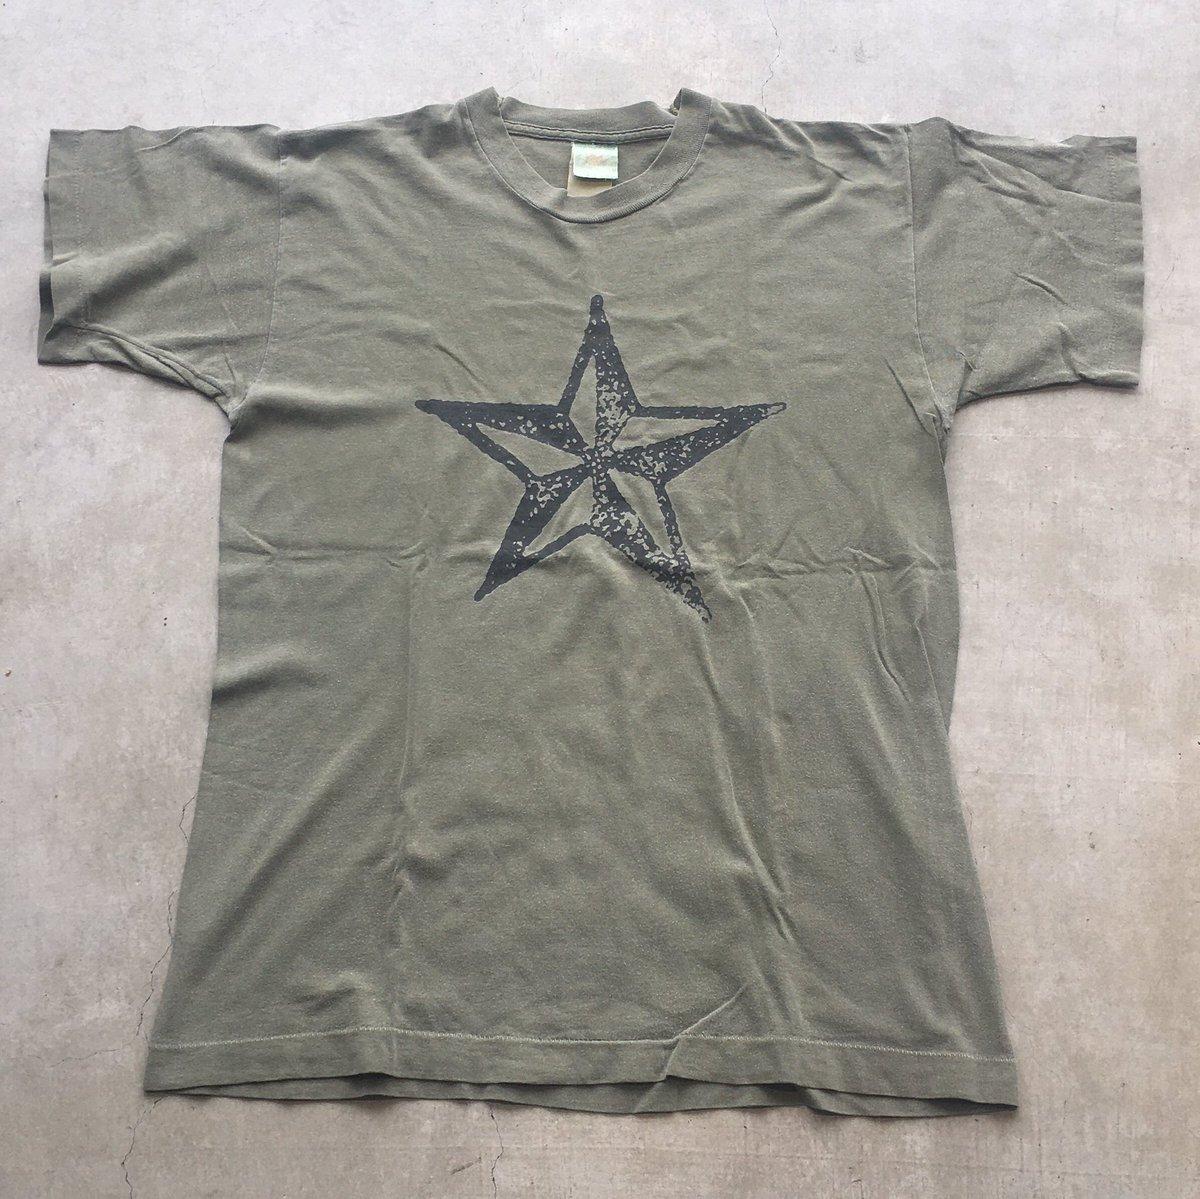 ▽△ Pick up ▽△  ⇧ Vintage Rock Tshirts ⇧  夏のファッションの主役といえばTシャツってことで、70s〜90sまで様々なビンテージロックTが入荷中です🙌  *通販可能です  #古着 #仙台 #古着屋 #vintage #rock #tshirts https://t.co/OiznAbzyU3